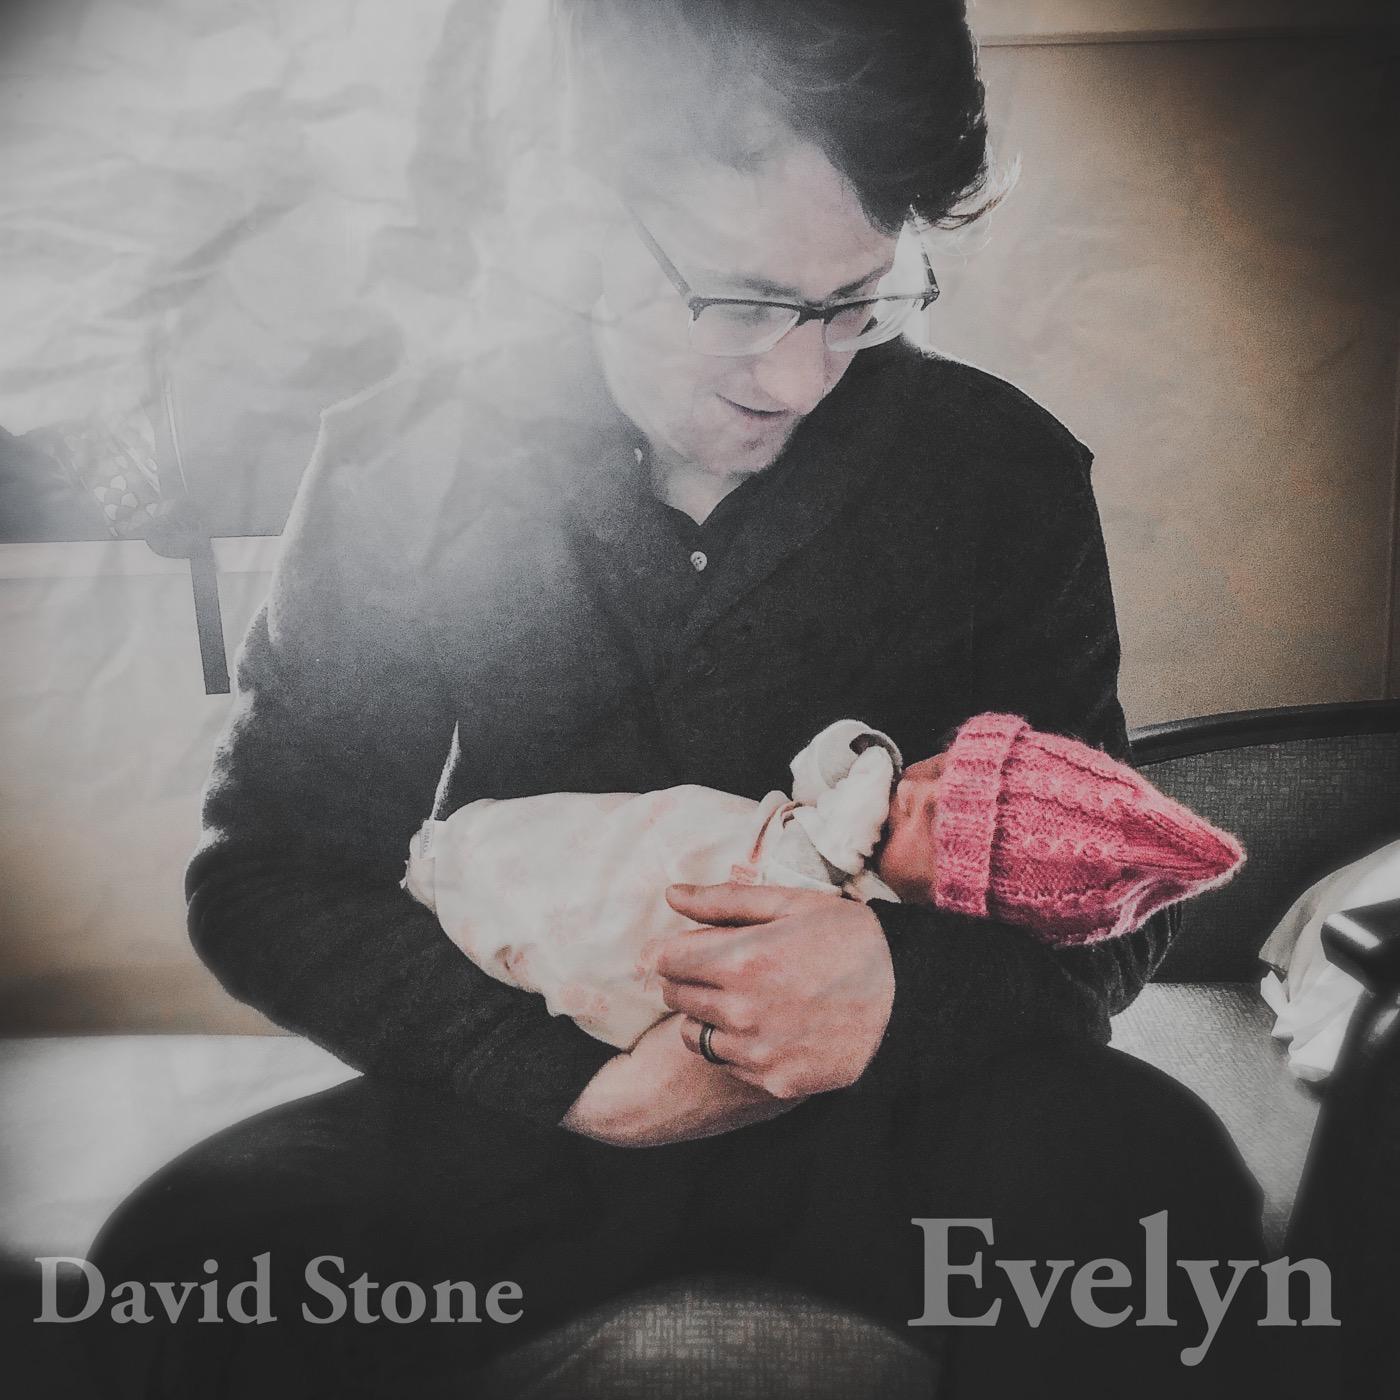 David Stone - Evelyn